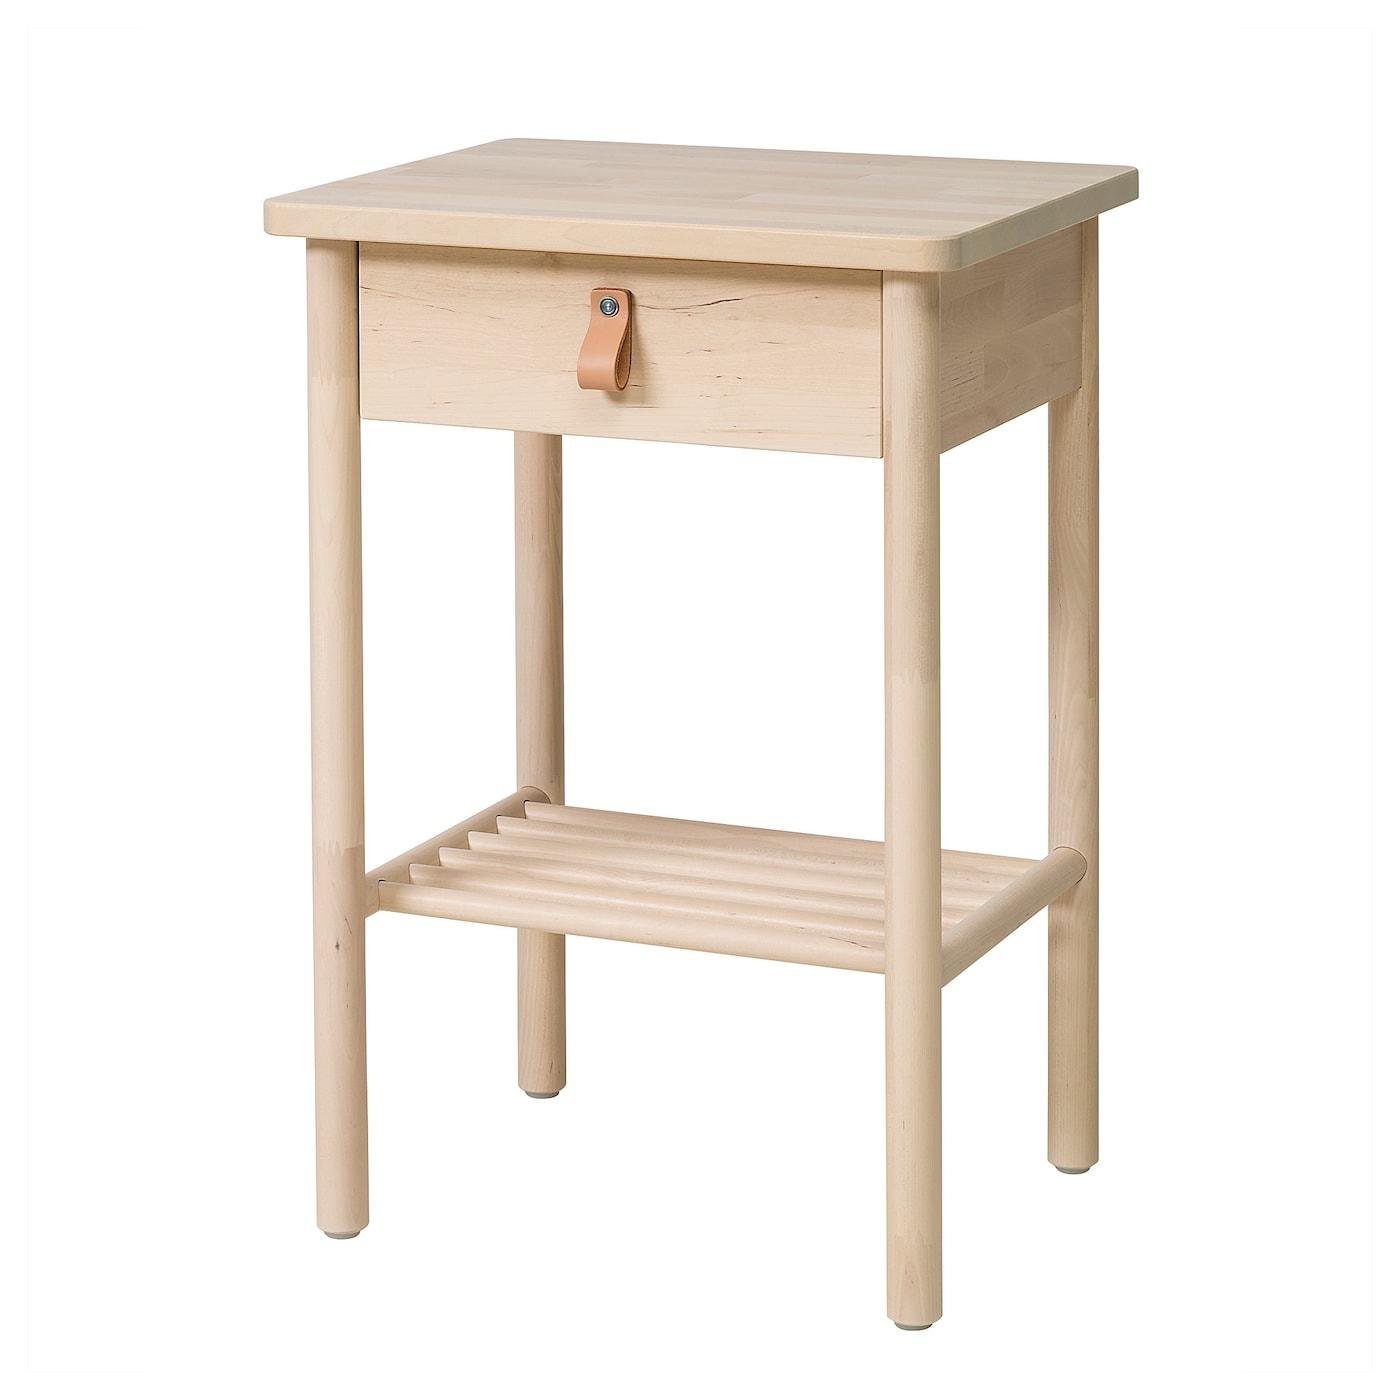 Ikea Small Bedroom Bedside Tables Amp Bedside Cabinets Ikea